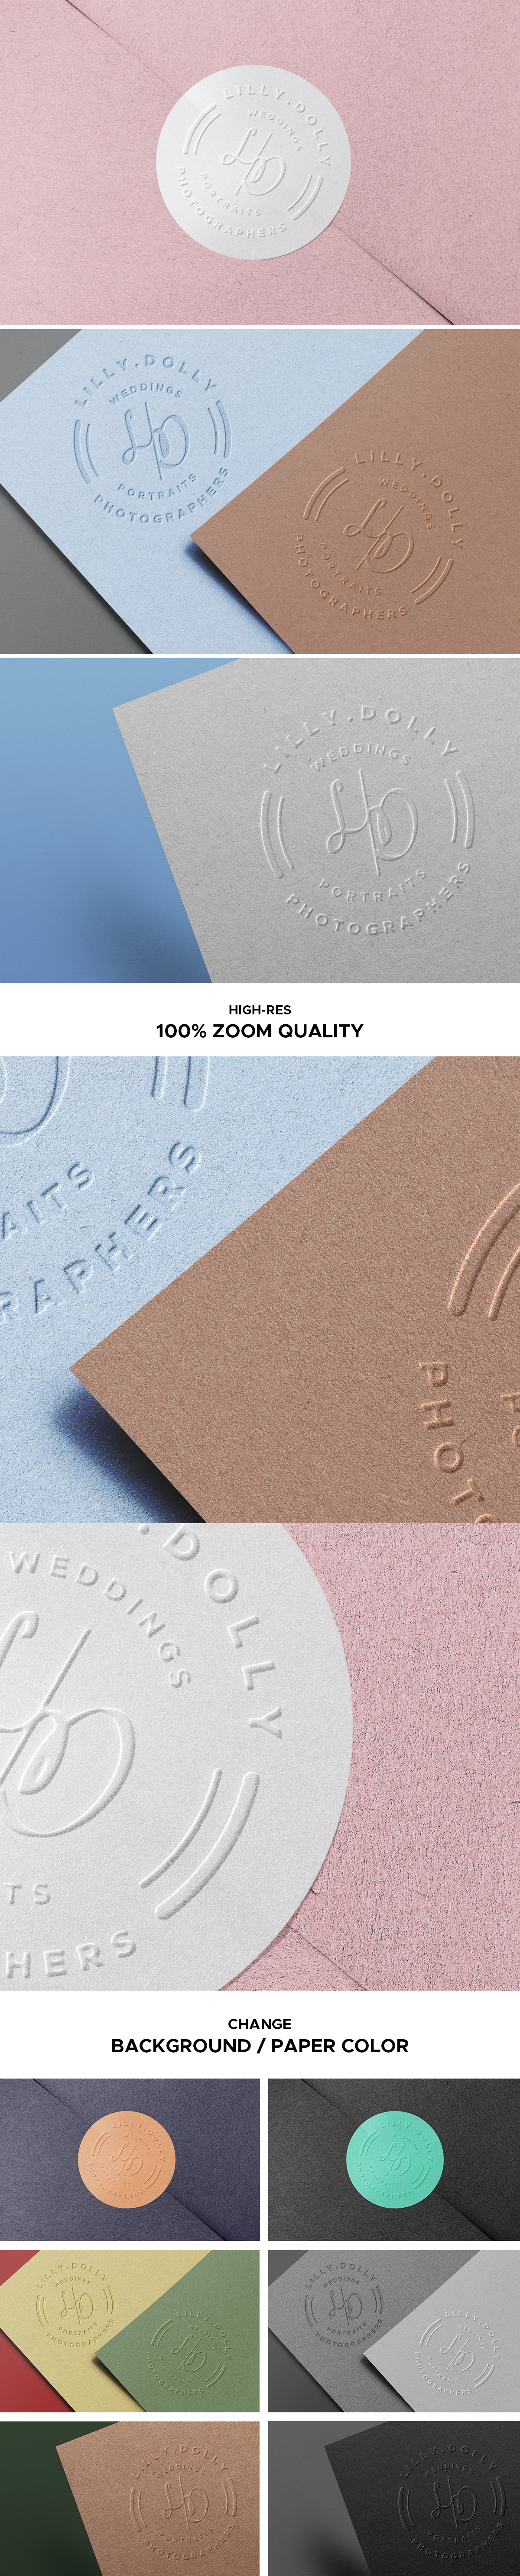 Embossed Paper Logo Mockups